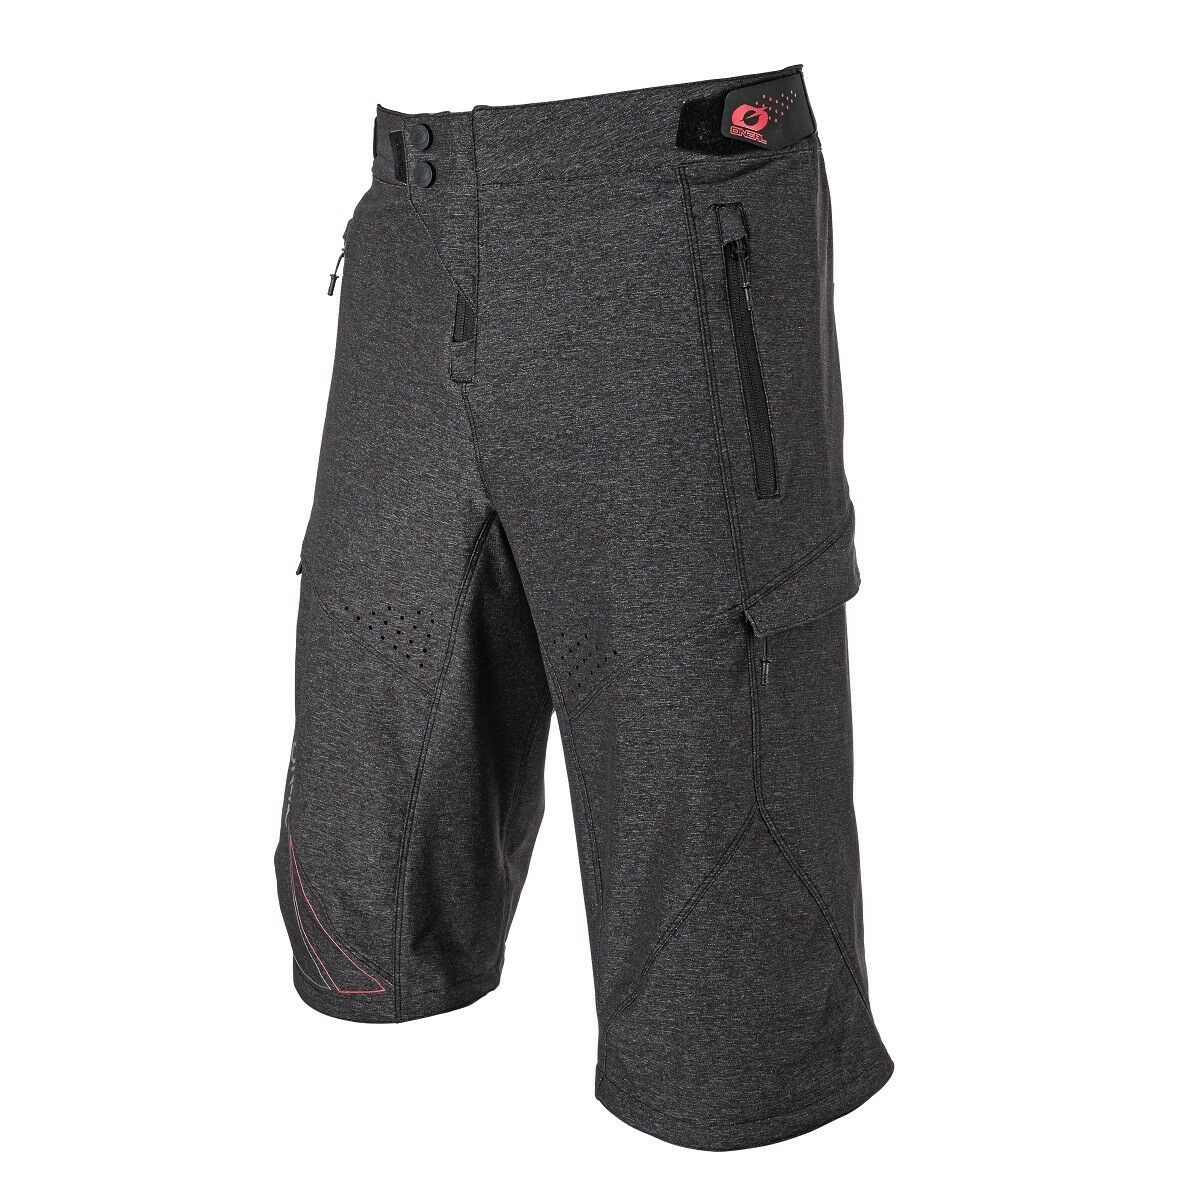 O'Neal Stormrider Shorts Shorts Shorts Fahrrad Hose kurz, Grau-Rot MTB Mountainbike Downhill c45335